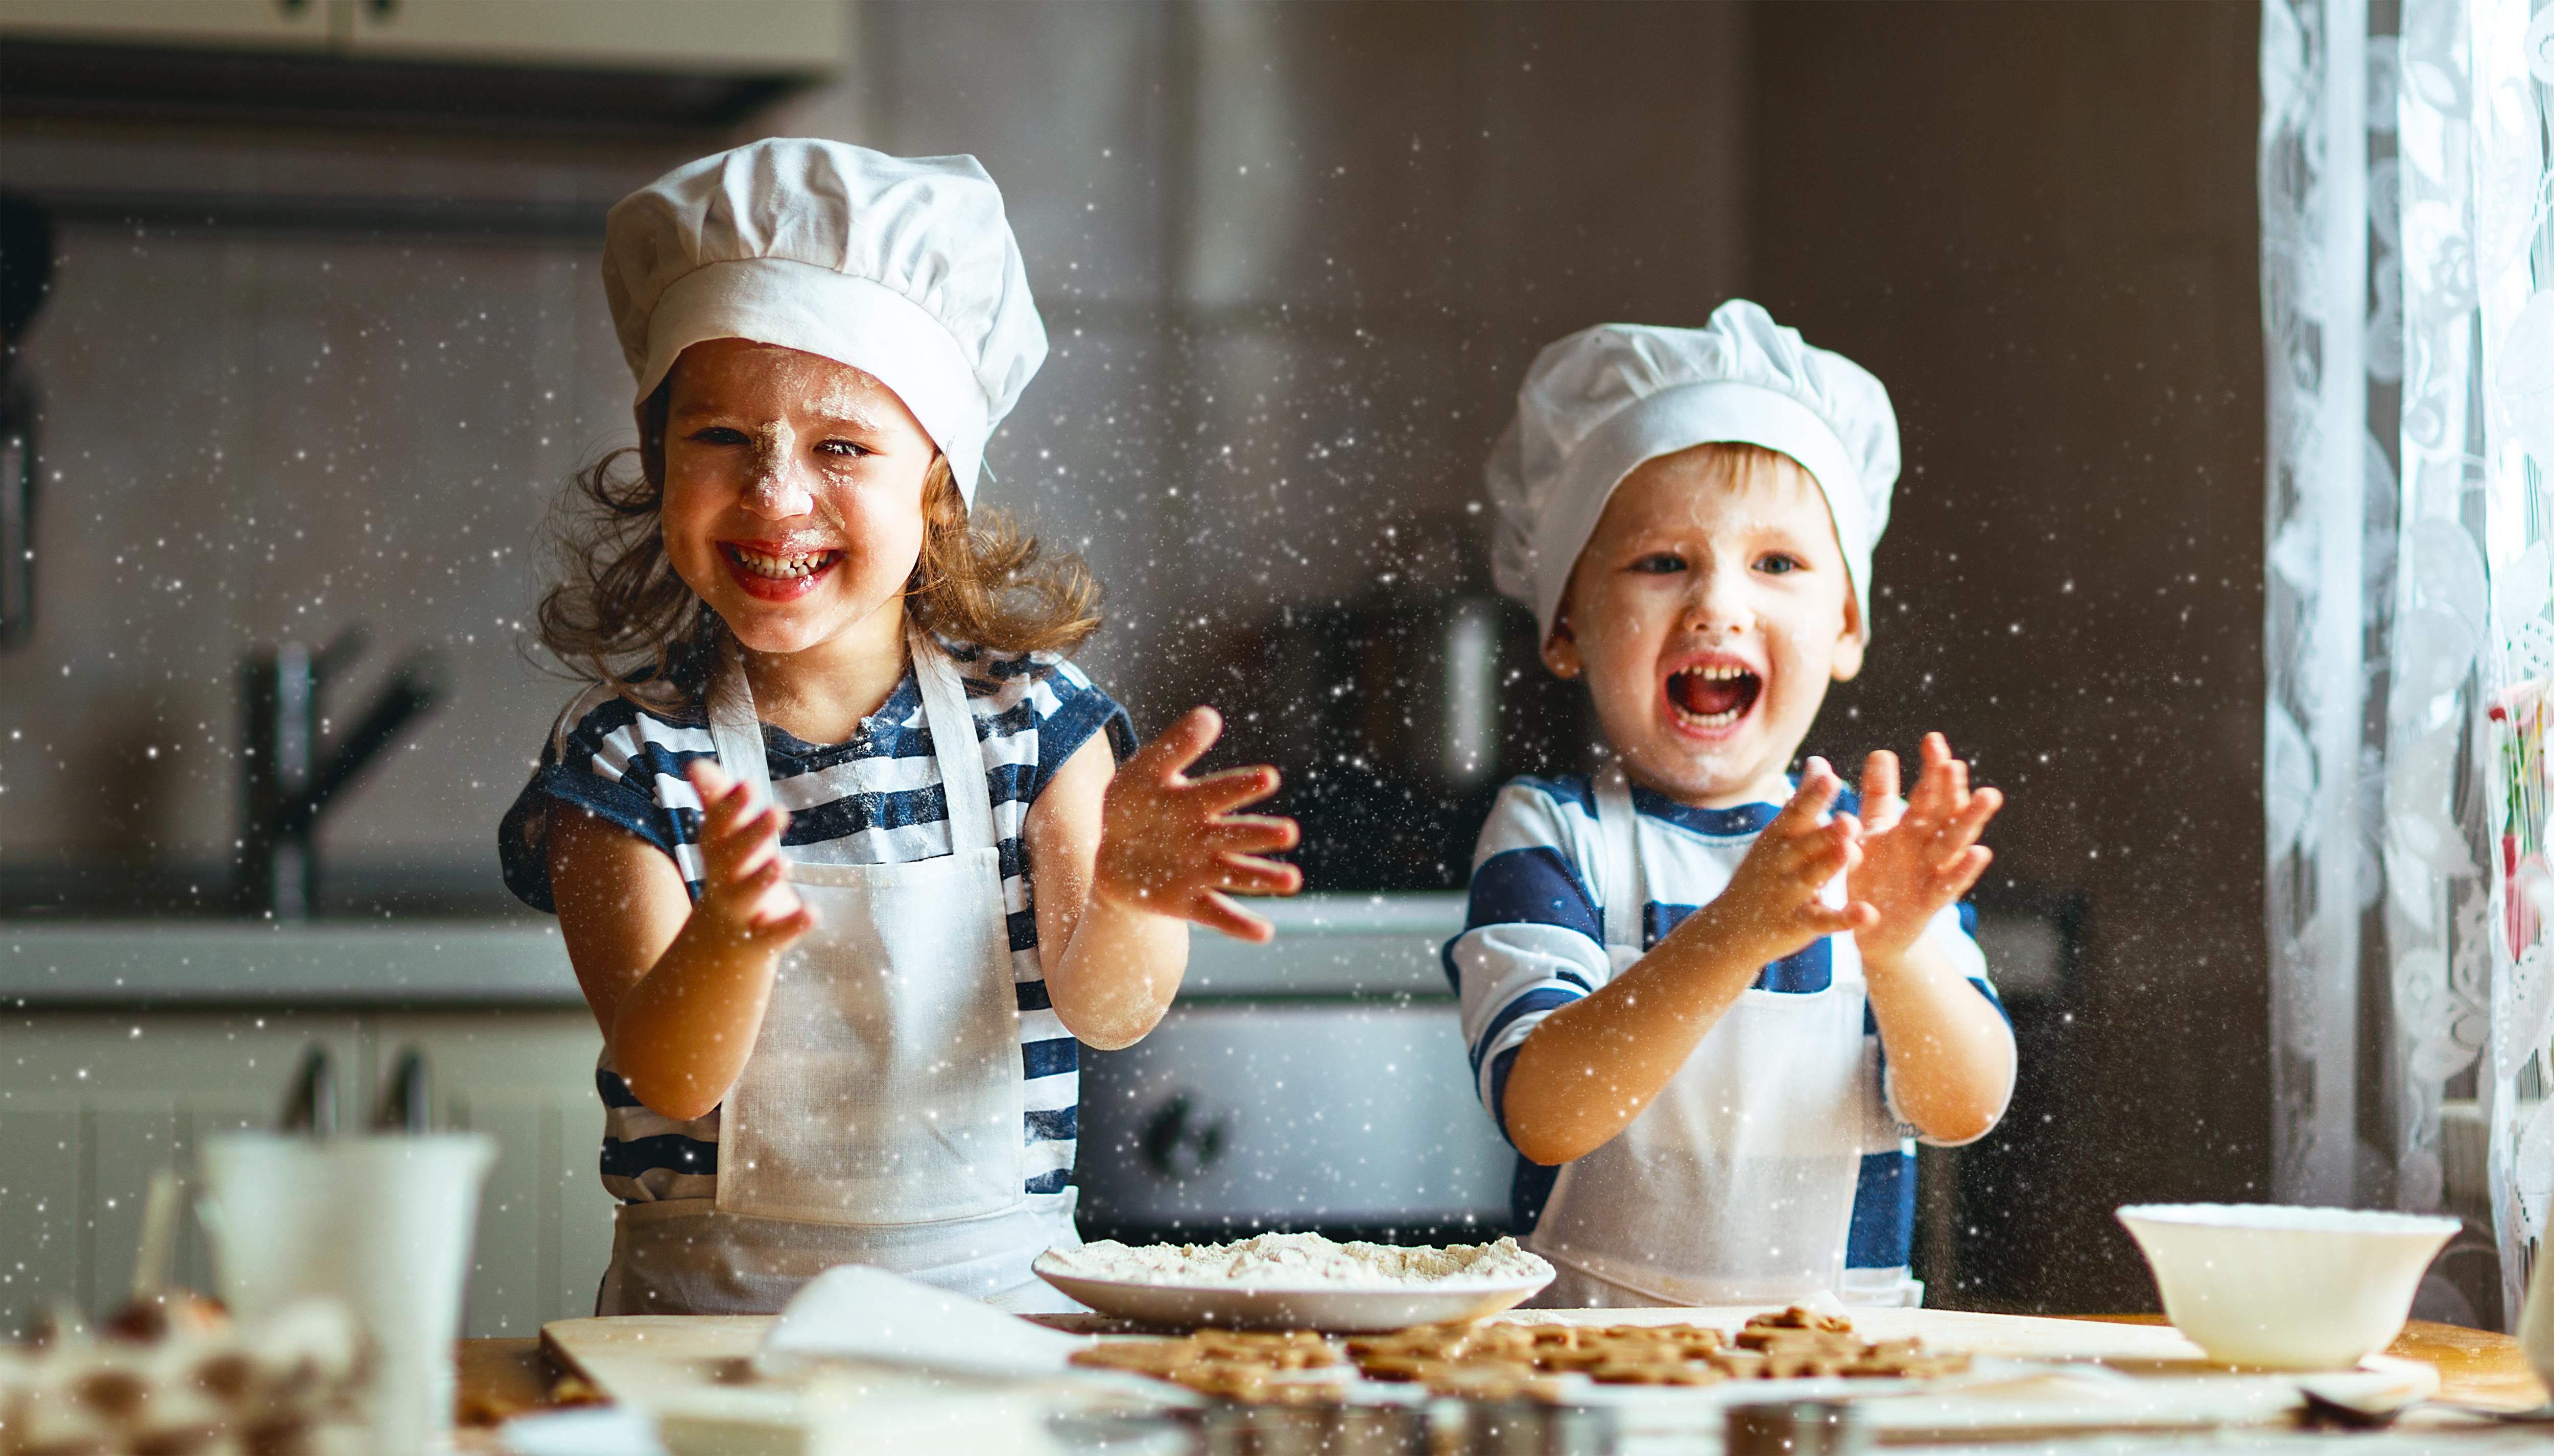 4 Easy Tips to Make Meal Prep More Effortless